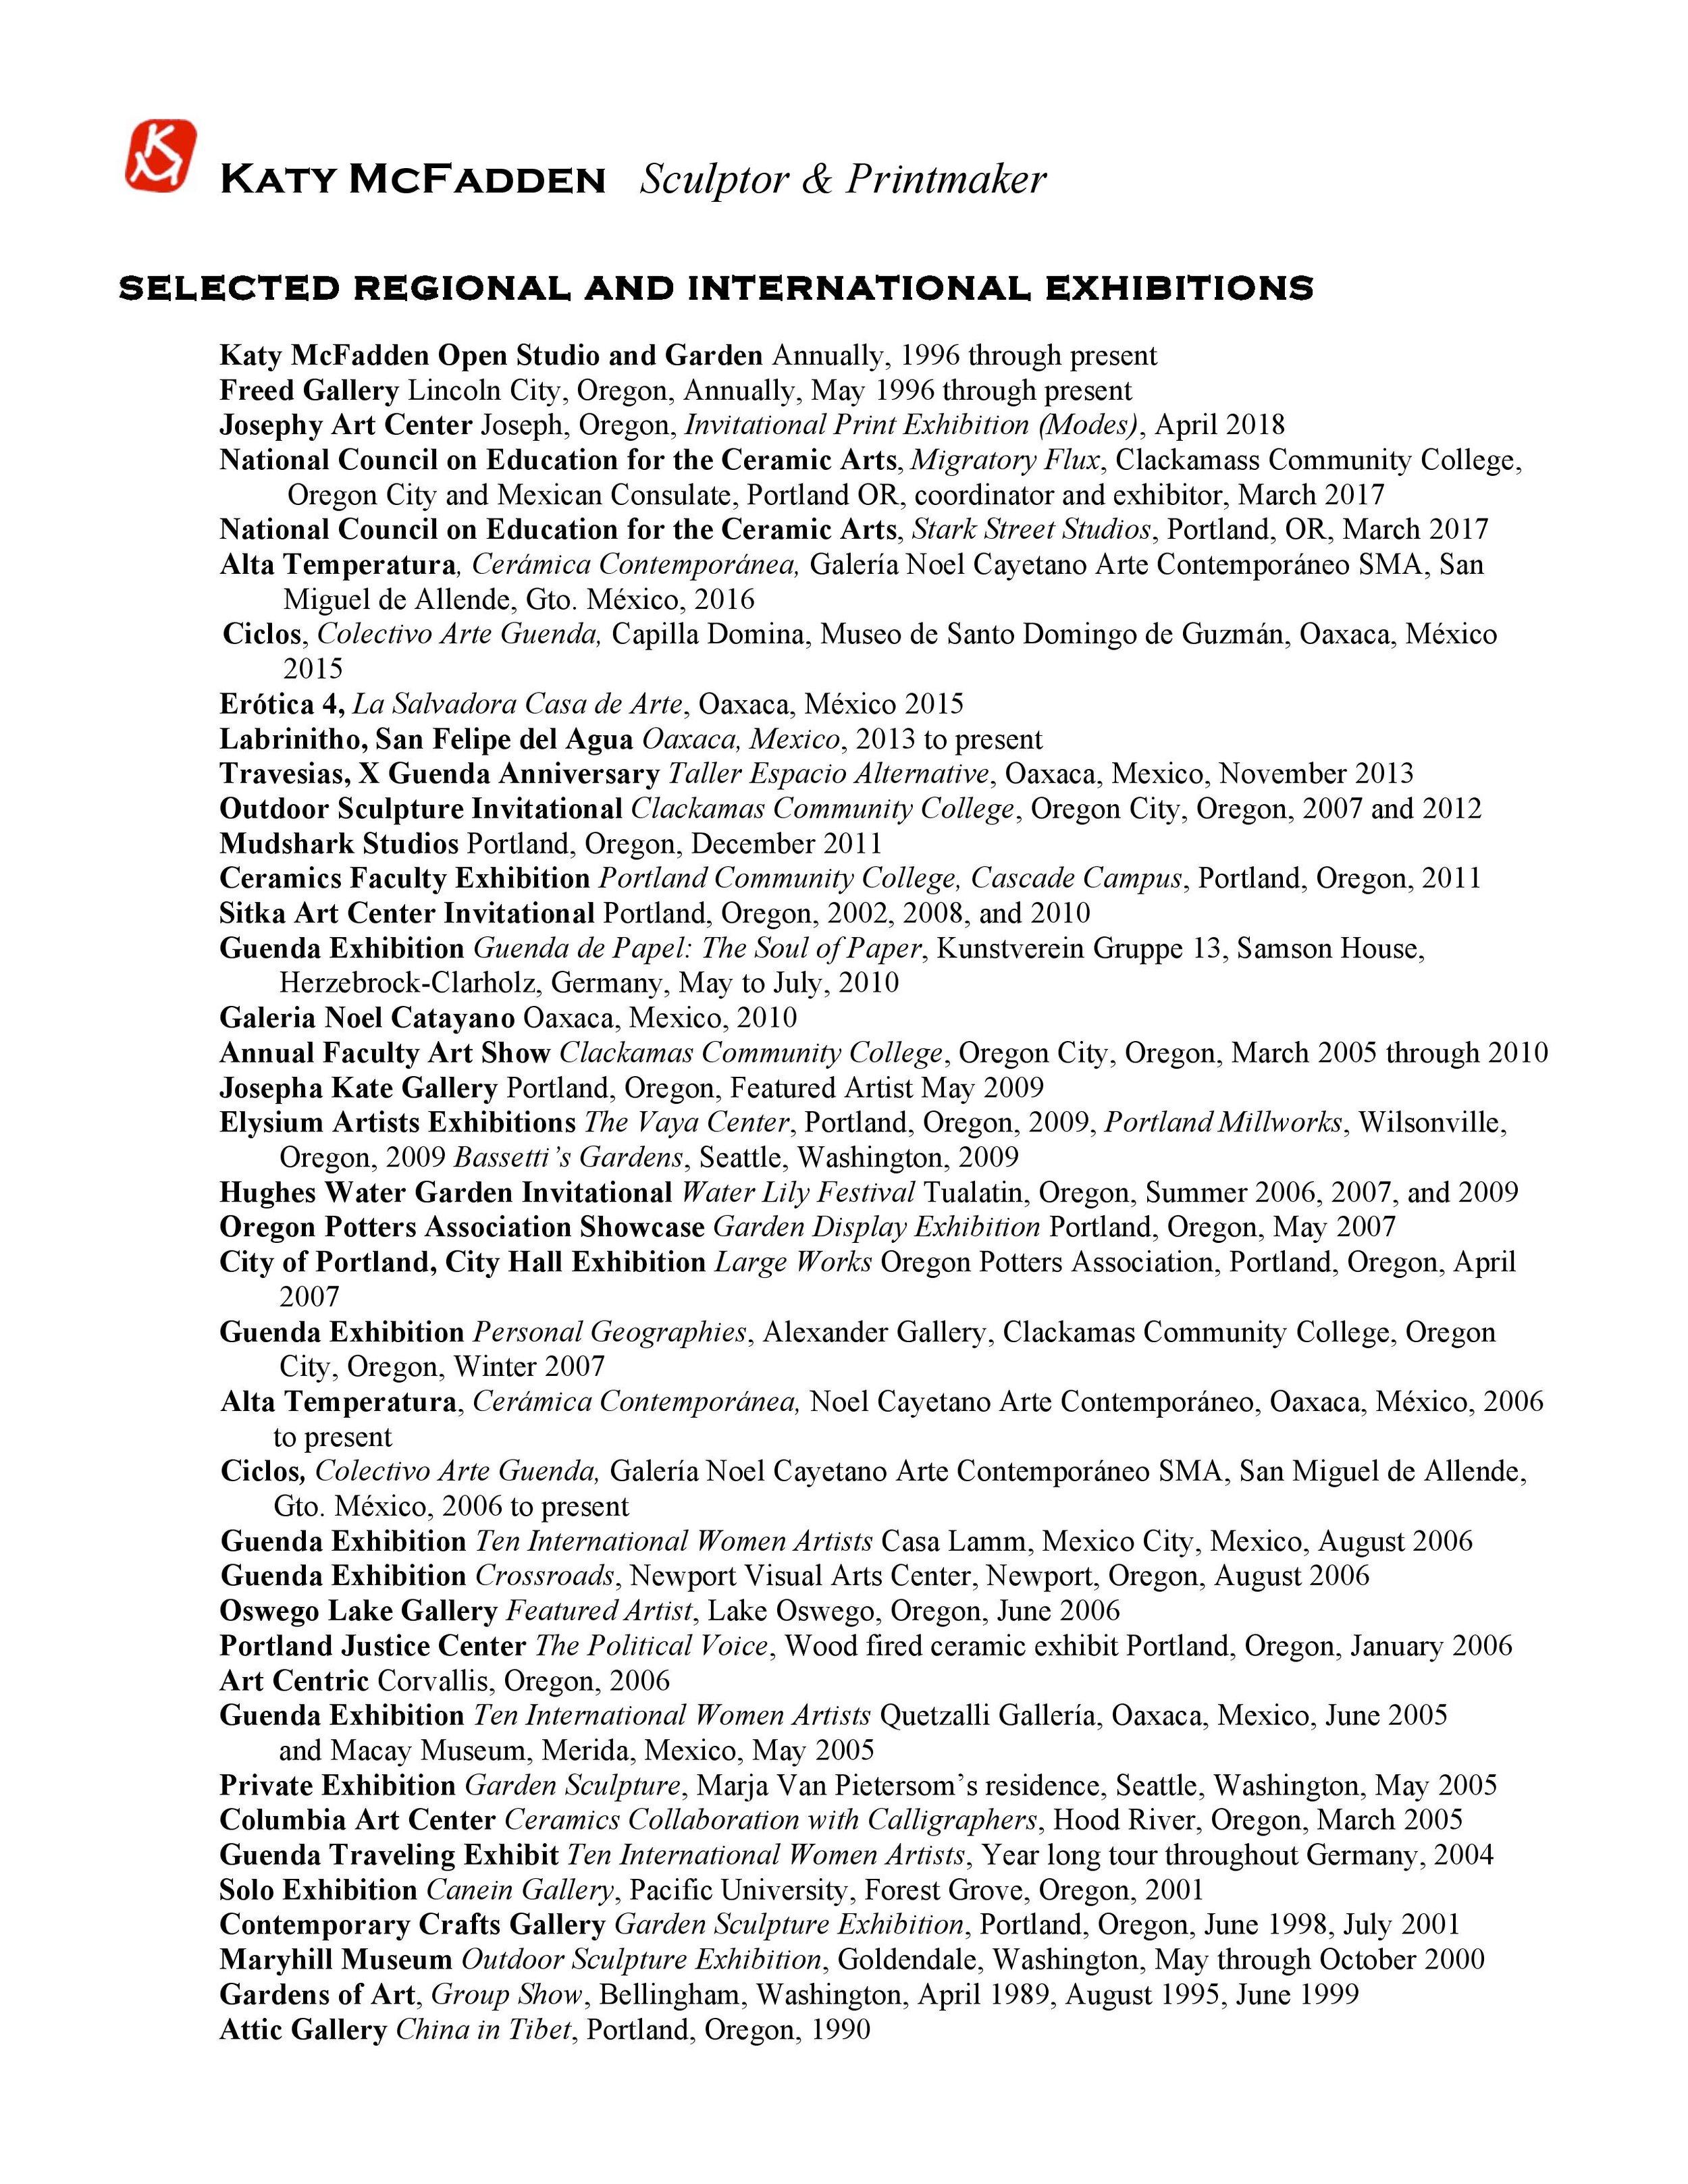 Resume_4-18-page-001(1).jpg